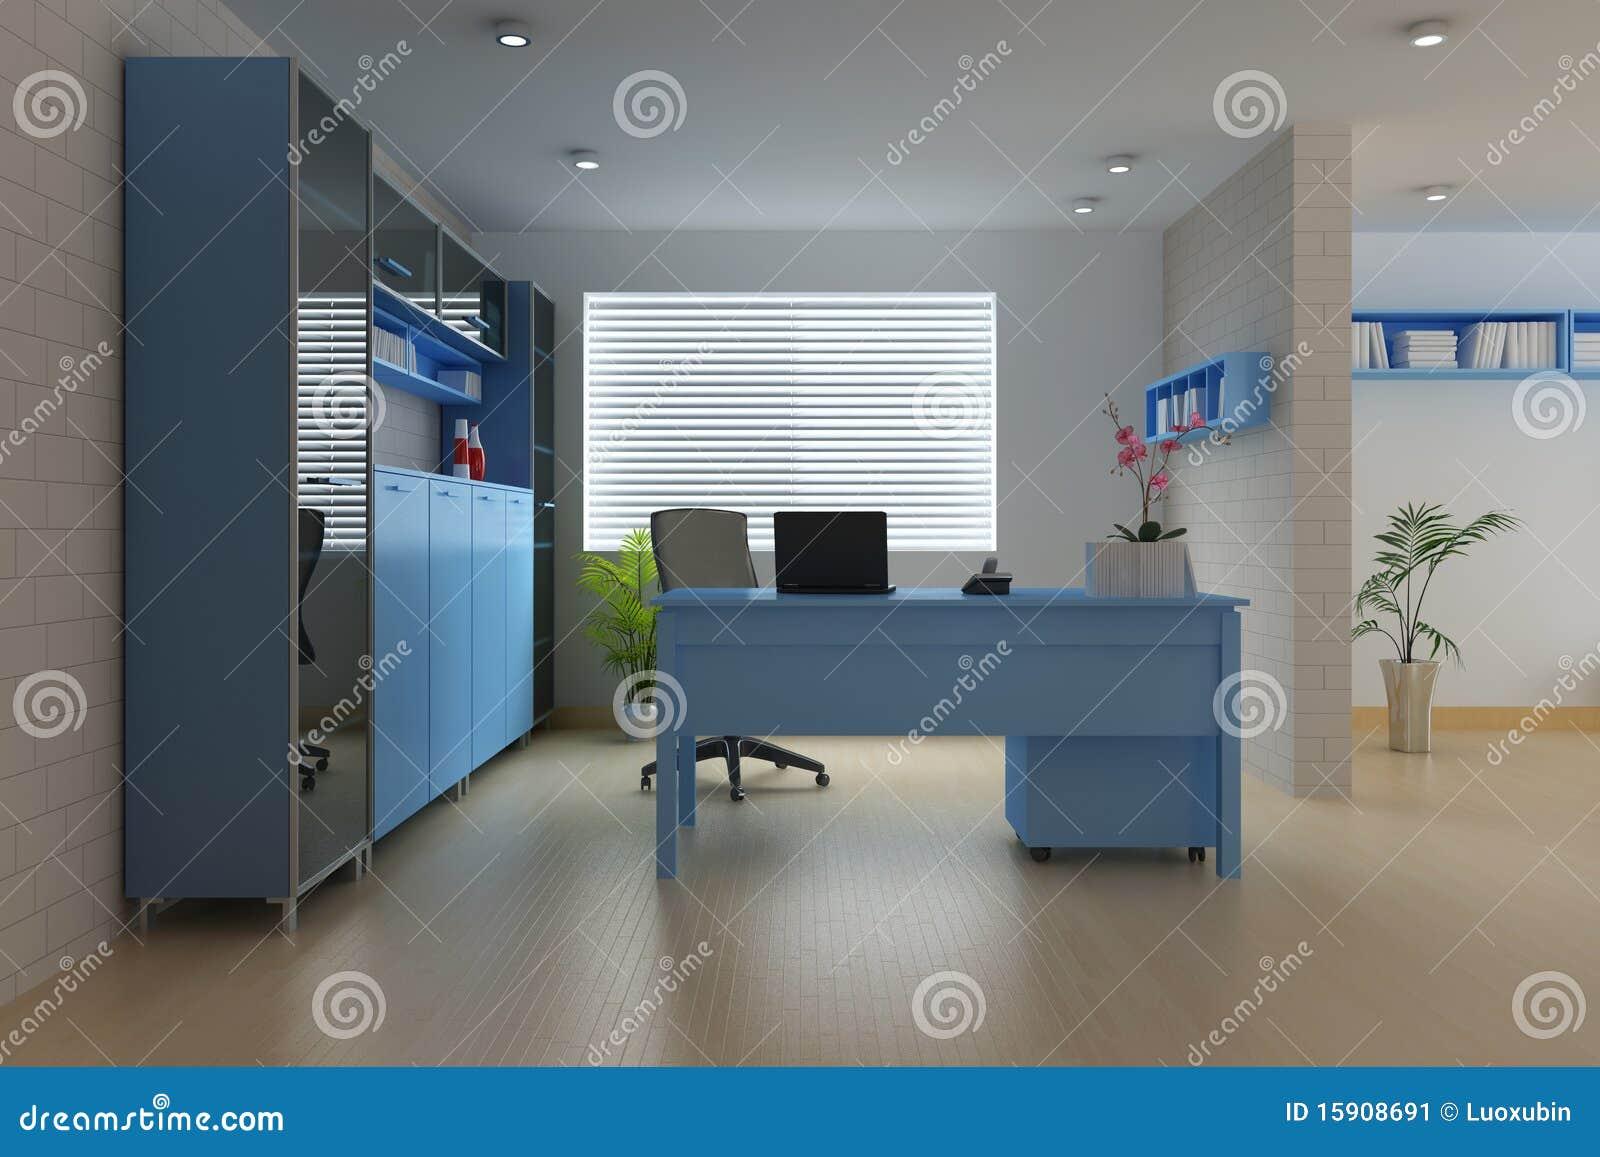 Modern Study Room Stock Image Image 15908691